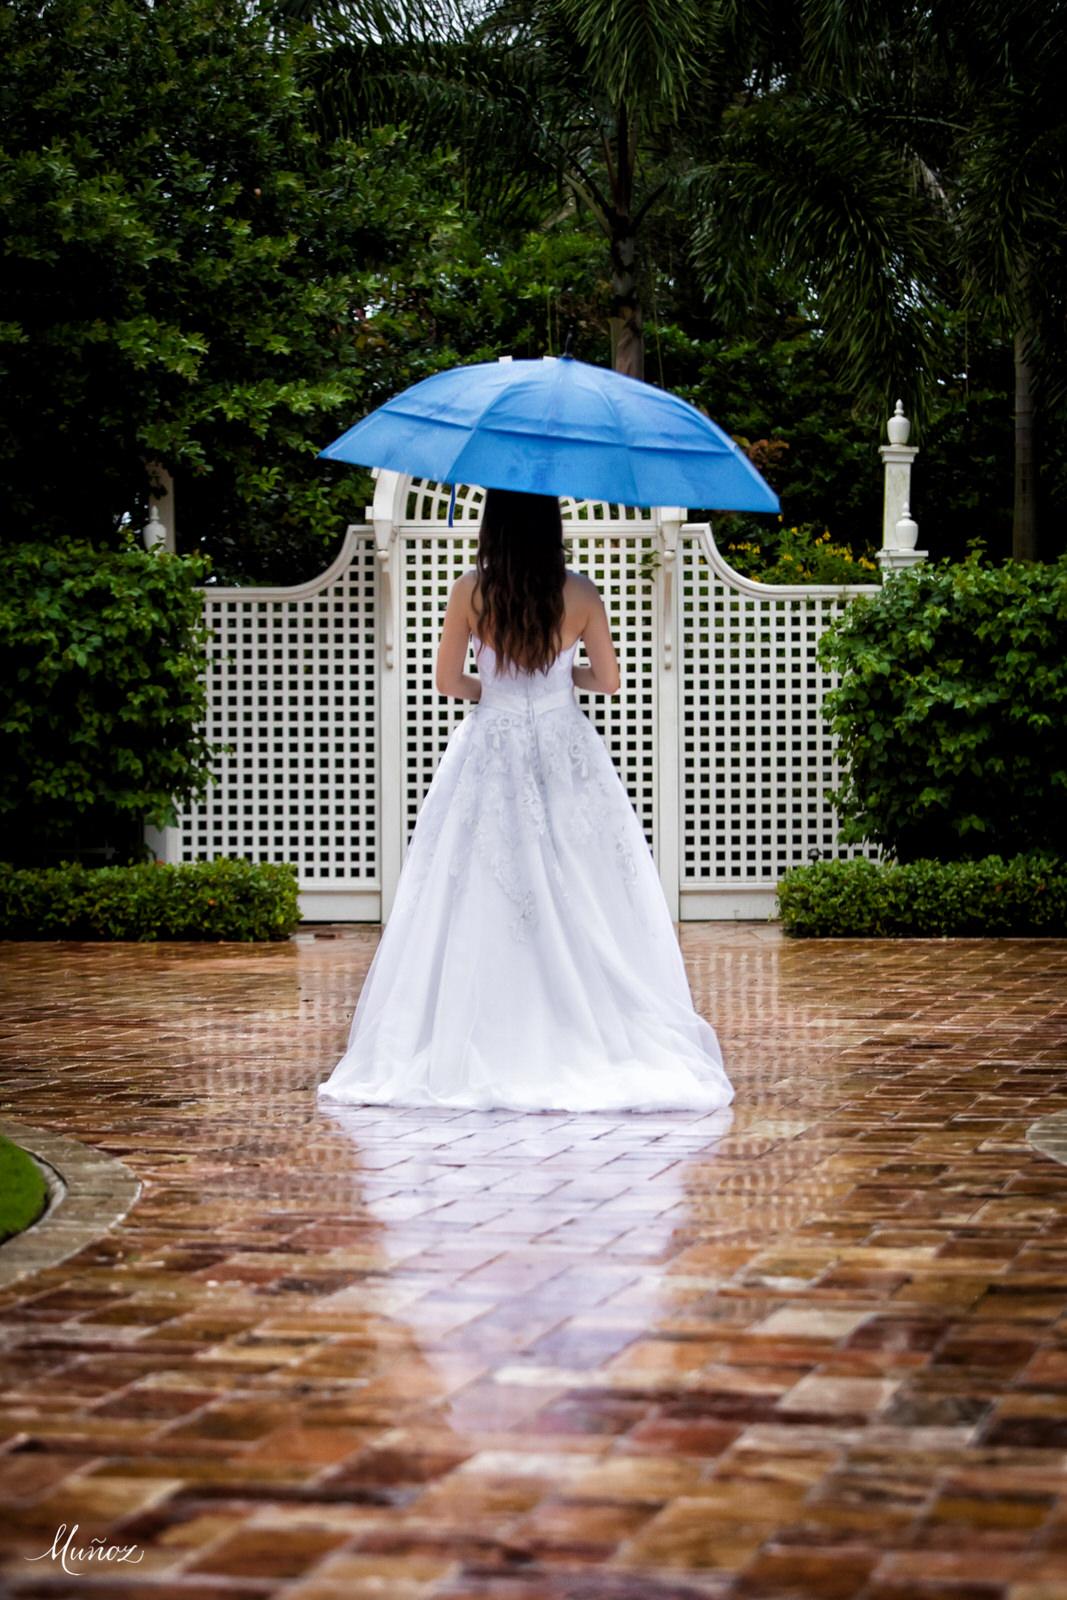 Rain and Something Blue